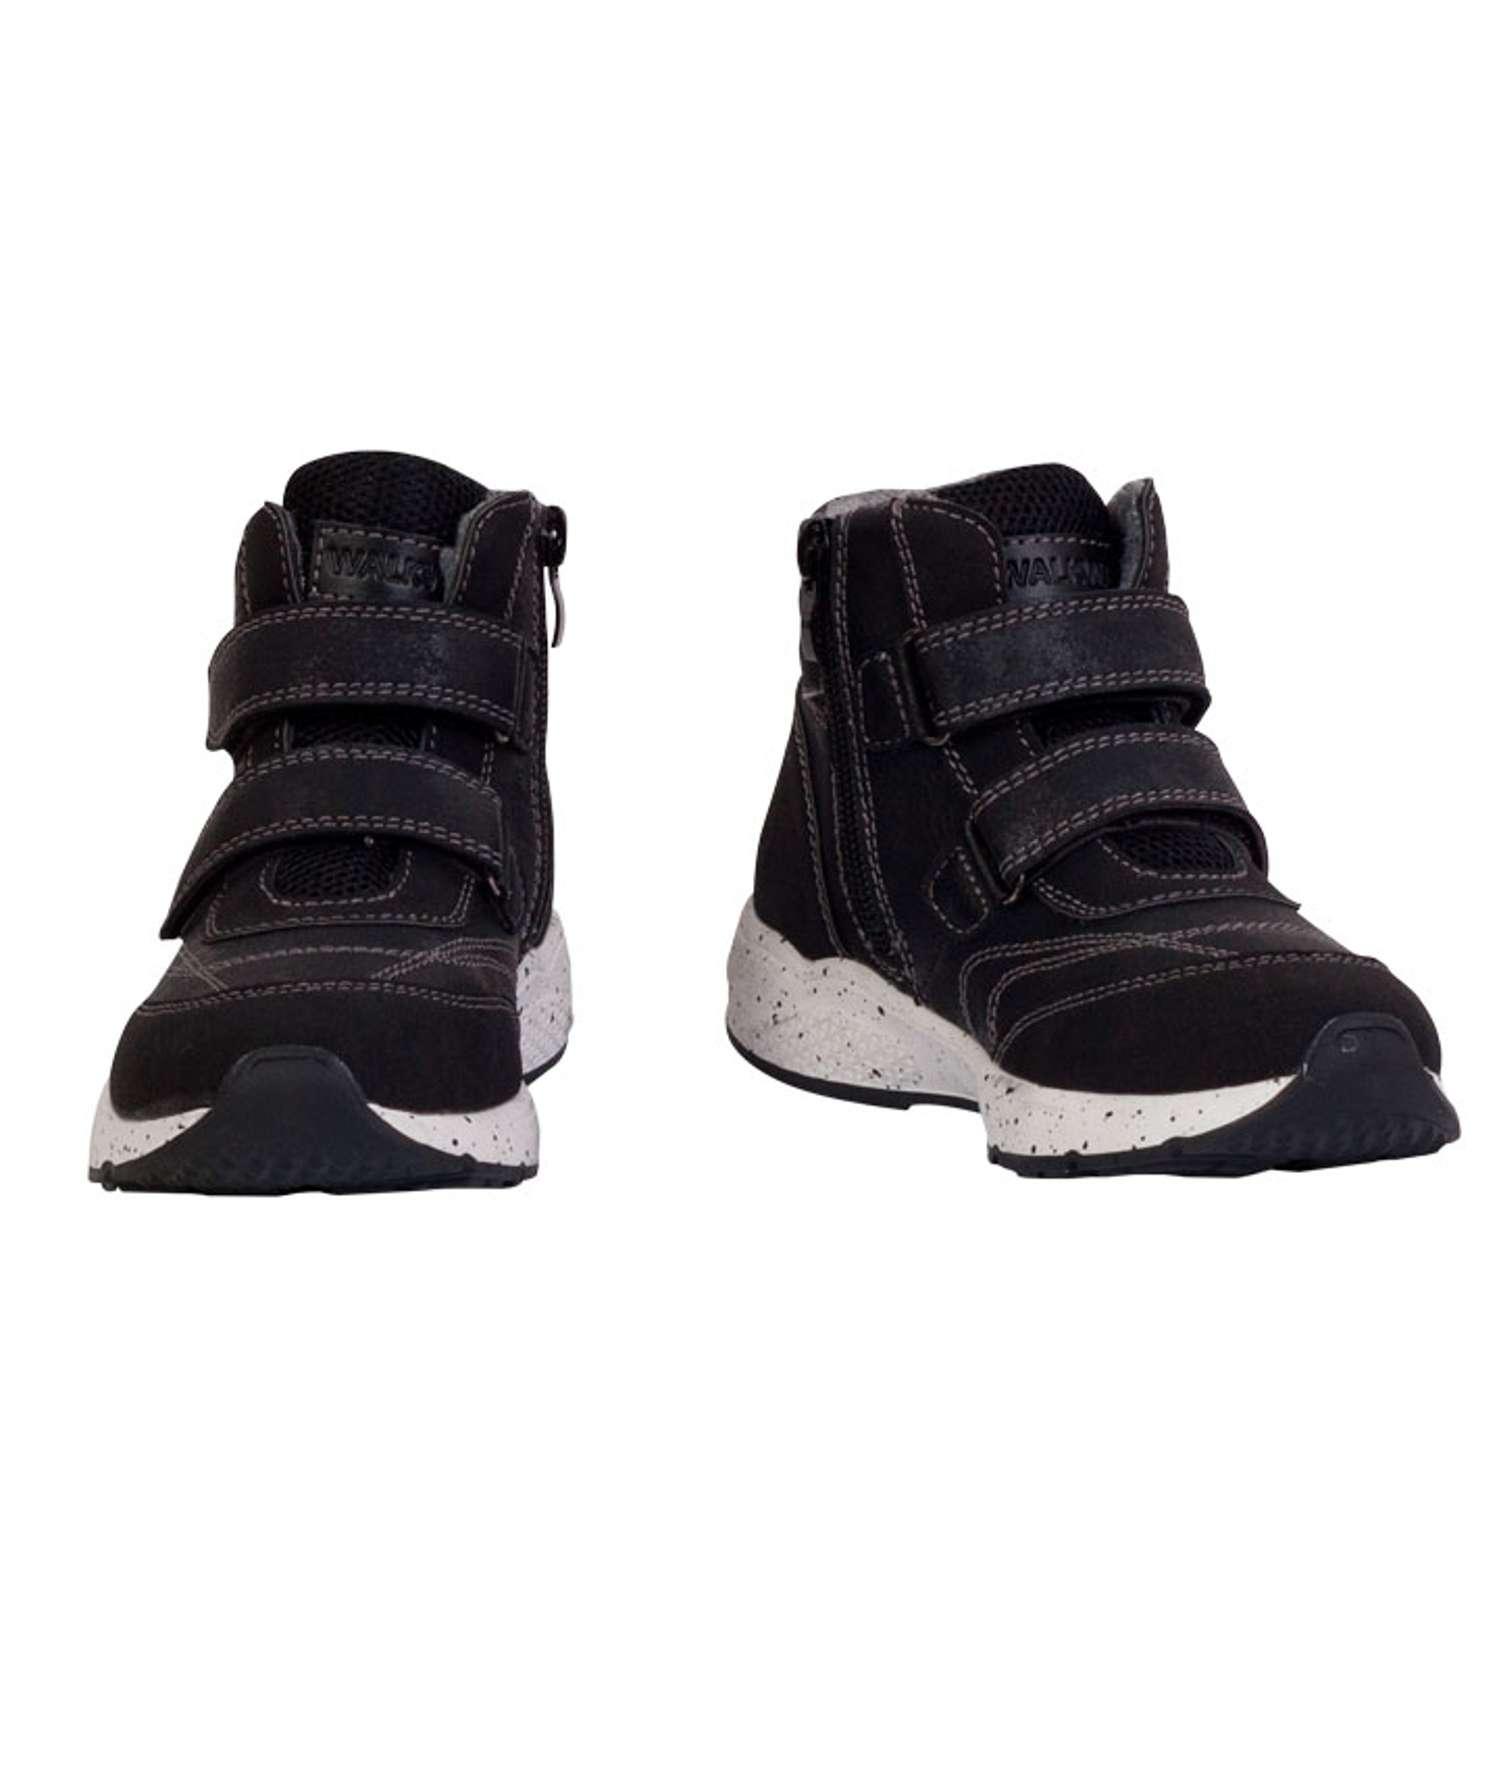 Walkway - Akako børne vinter sneakers - Sort - Størrelse 30